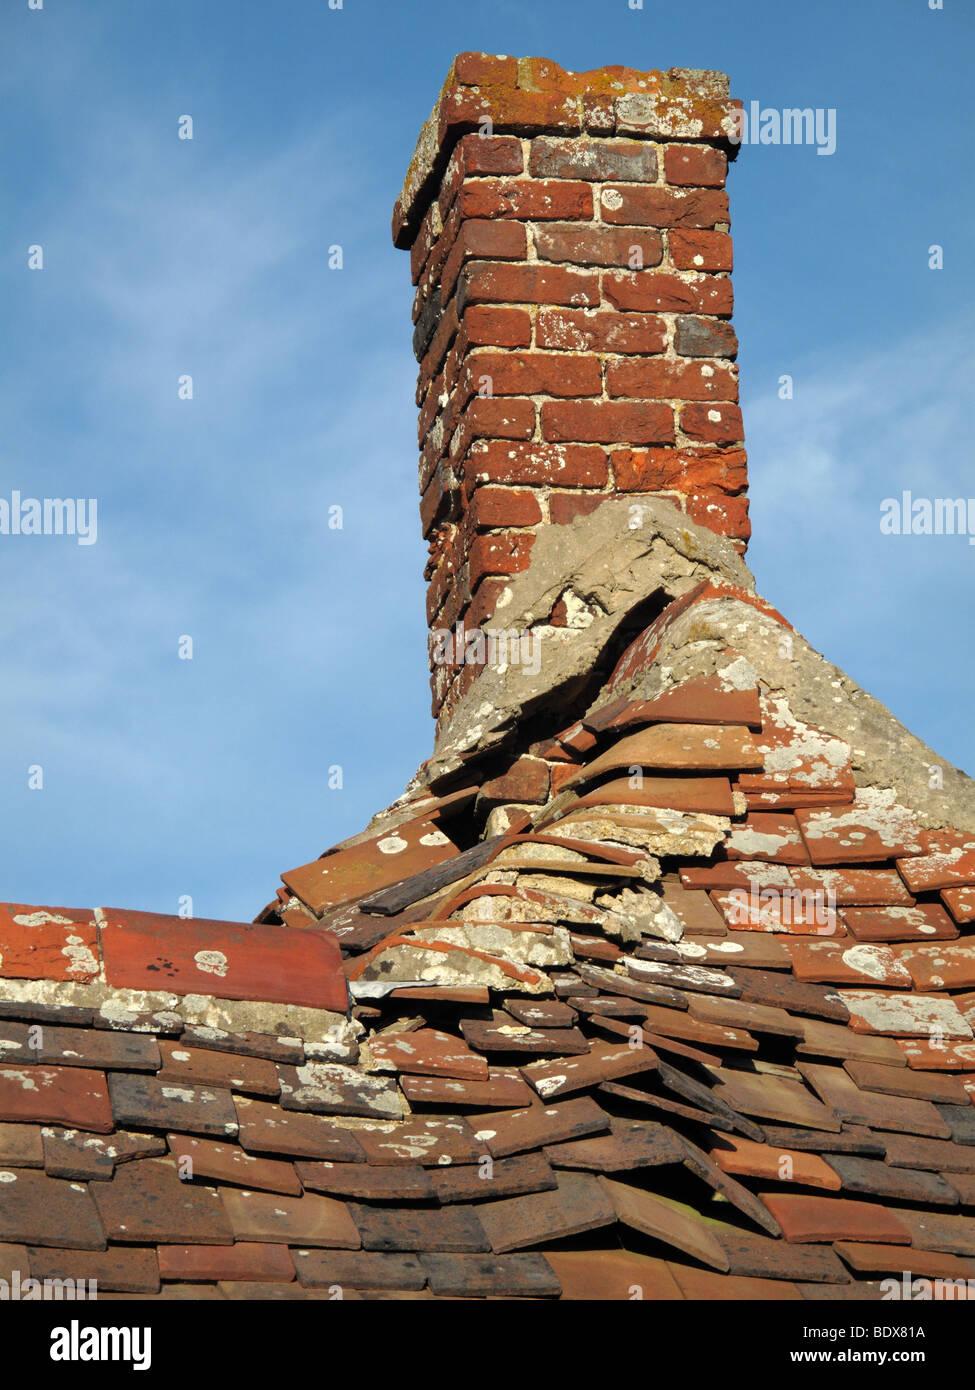 chimney pot on old roof stock photo: 25777958 - alamy